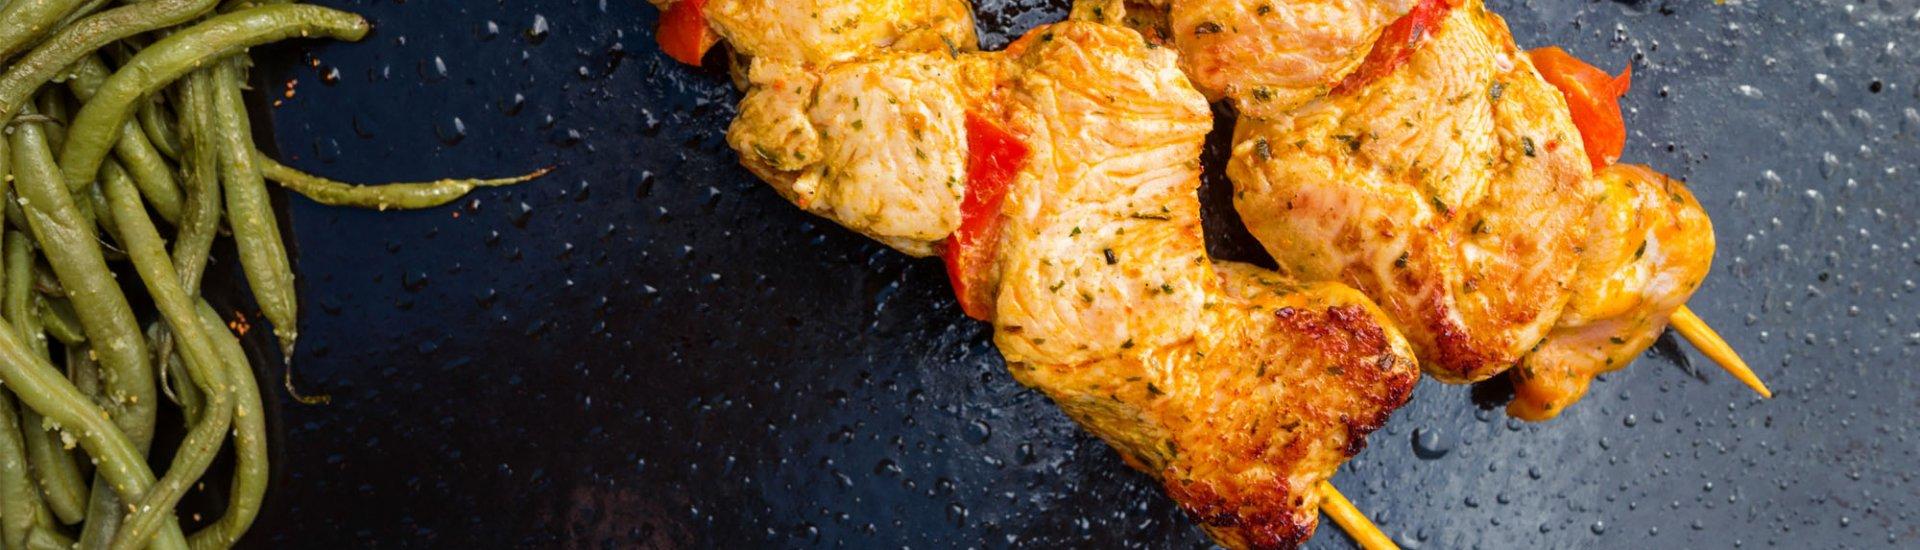 10 Plancha Grill Rezepte